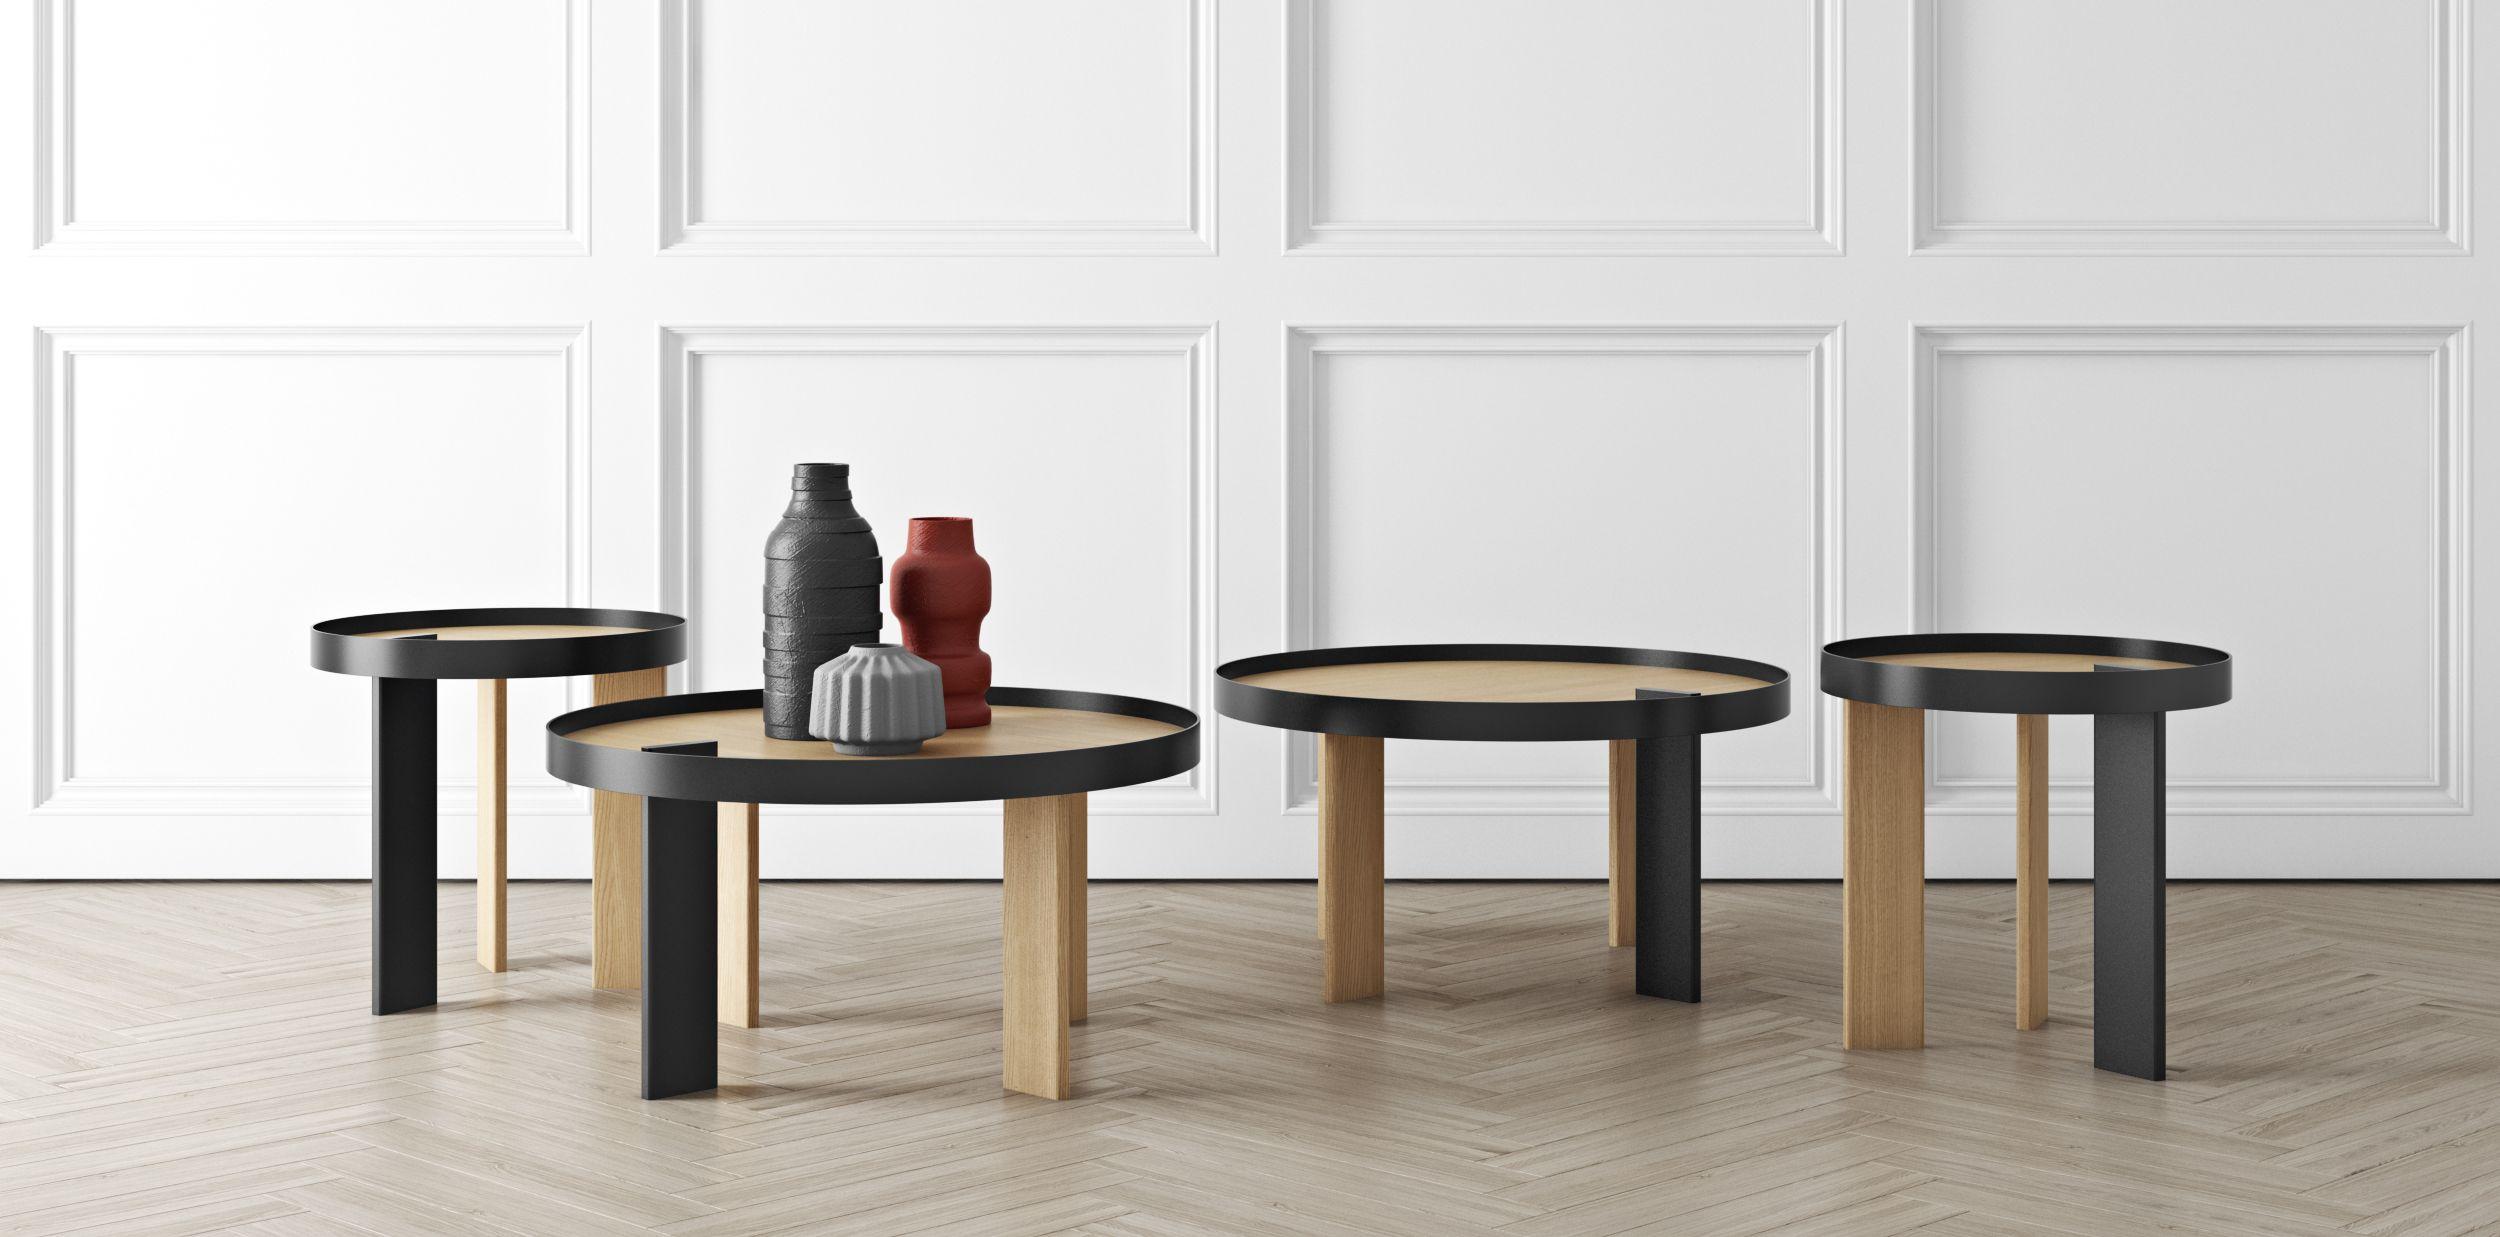 Table Basse Bruno Tema Home Partie Noire Contraste Et Bruno